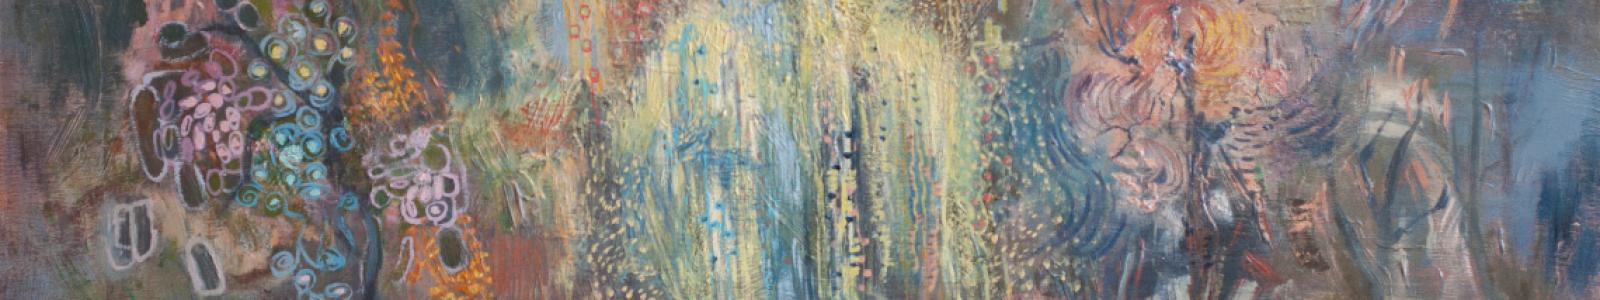 Gallery Painter Evgenia Erkenova